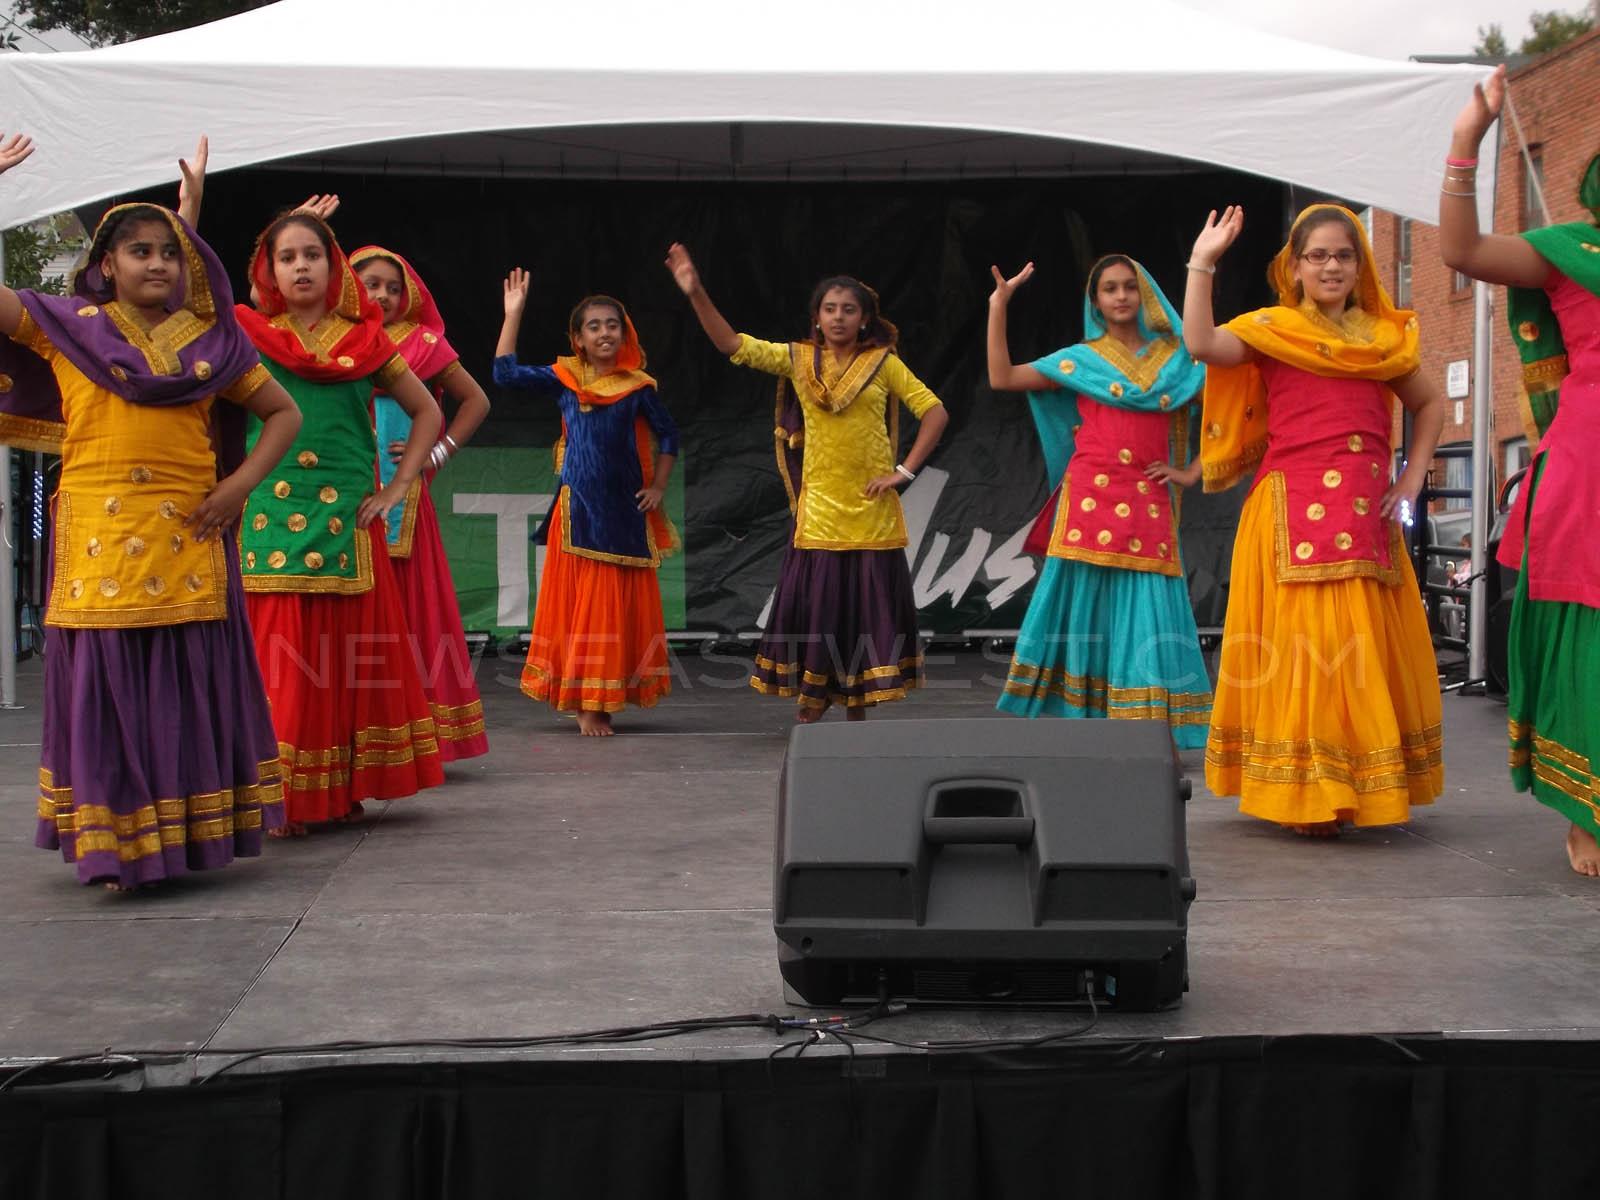 gerrard-india-bazaar-festival-2014-21